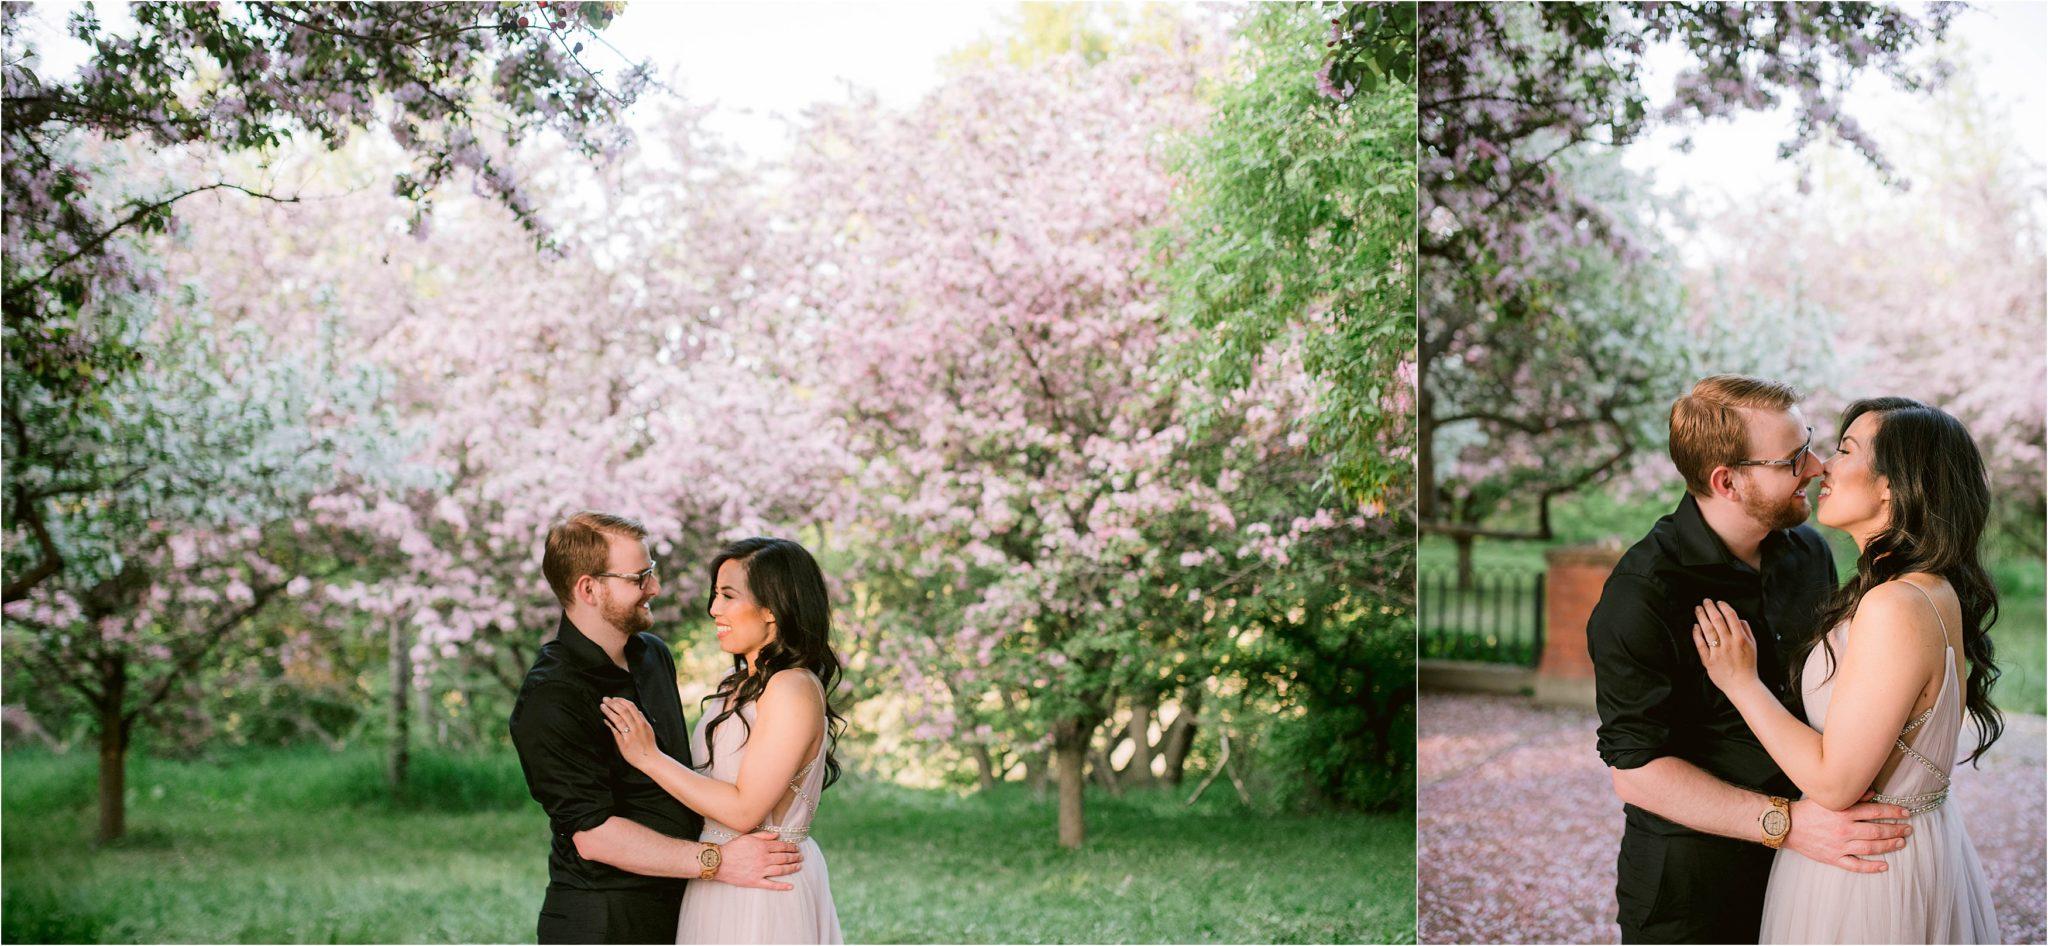 Romantic Cherry Blossoms Engagement Photos in Edmonton